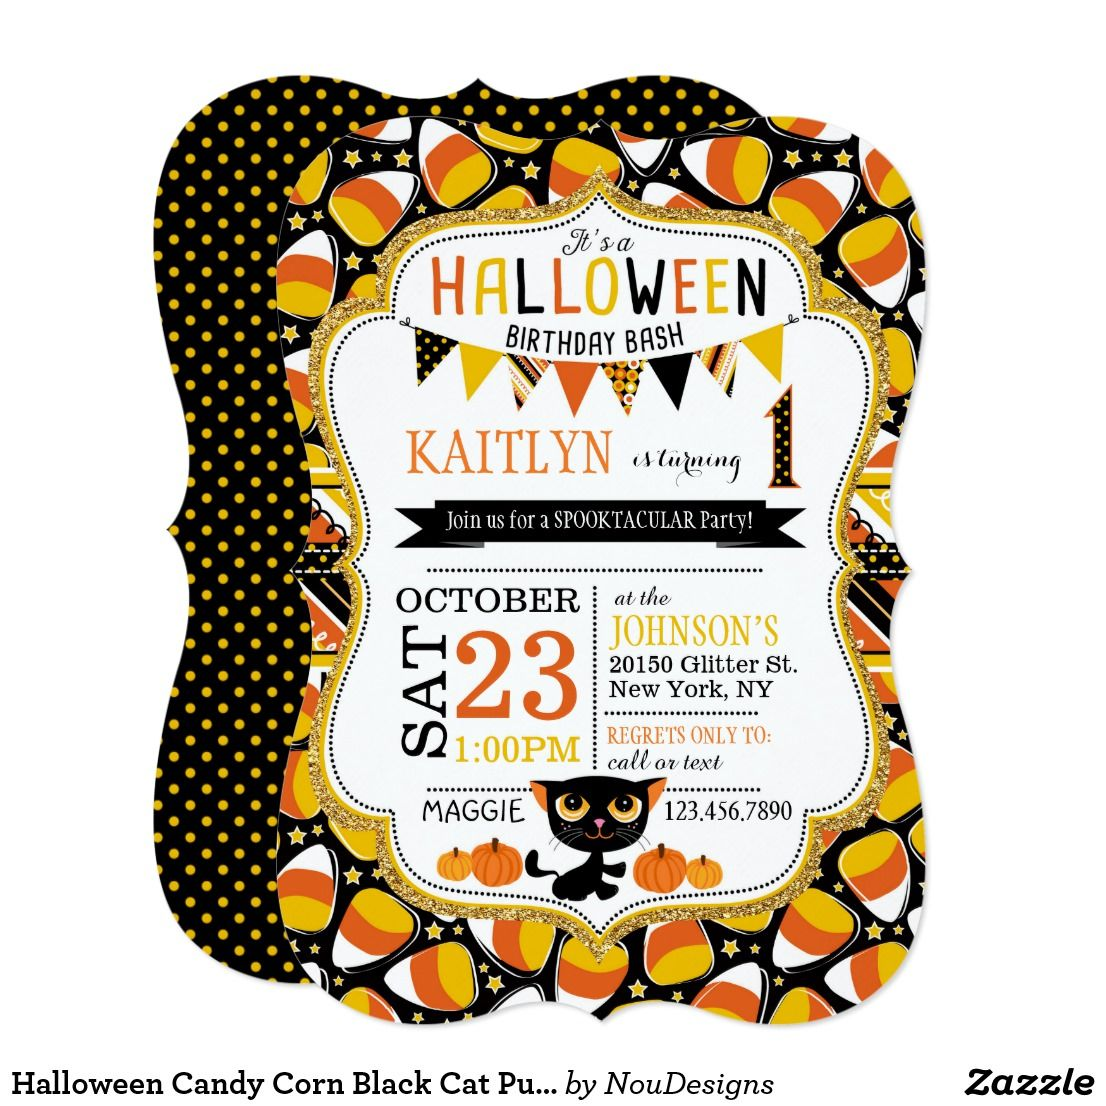 Halloween Candy Corn Black Cat Pumpkins Birthday